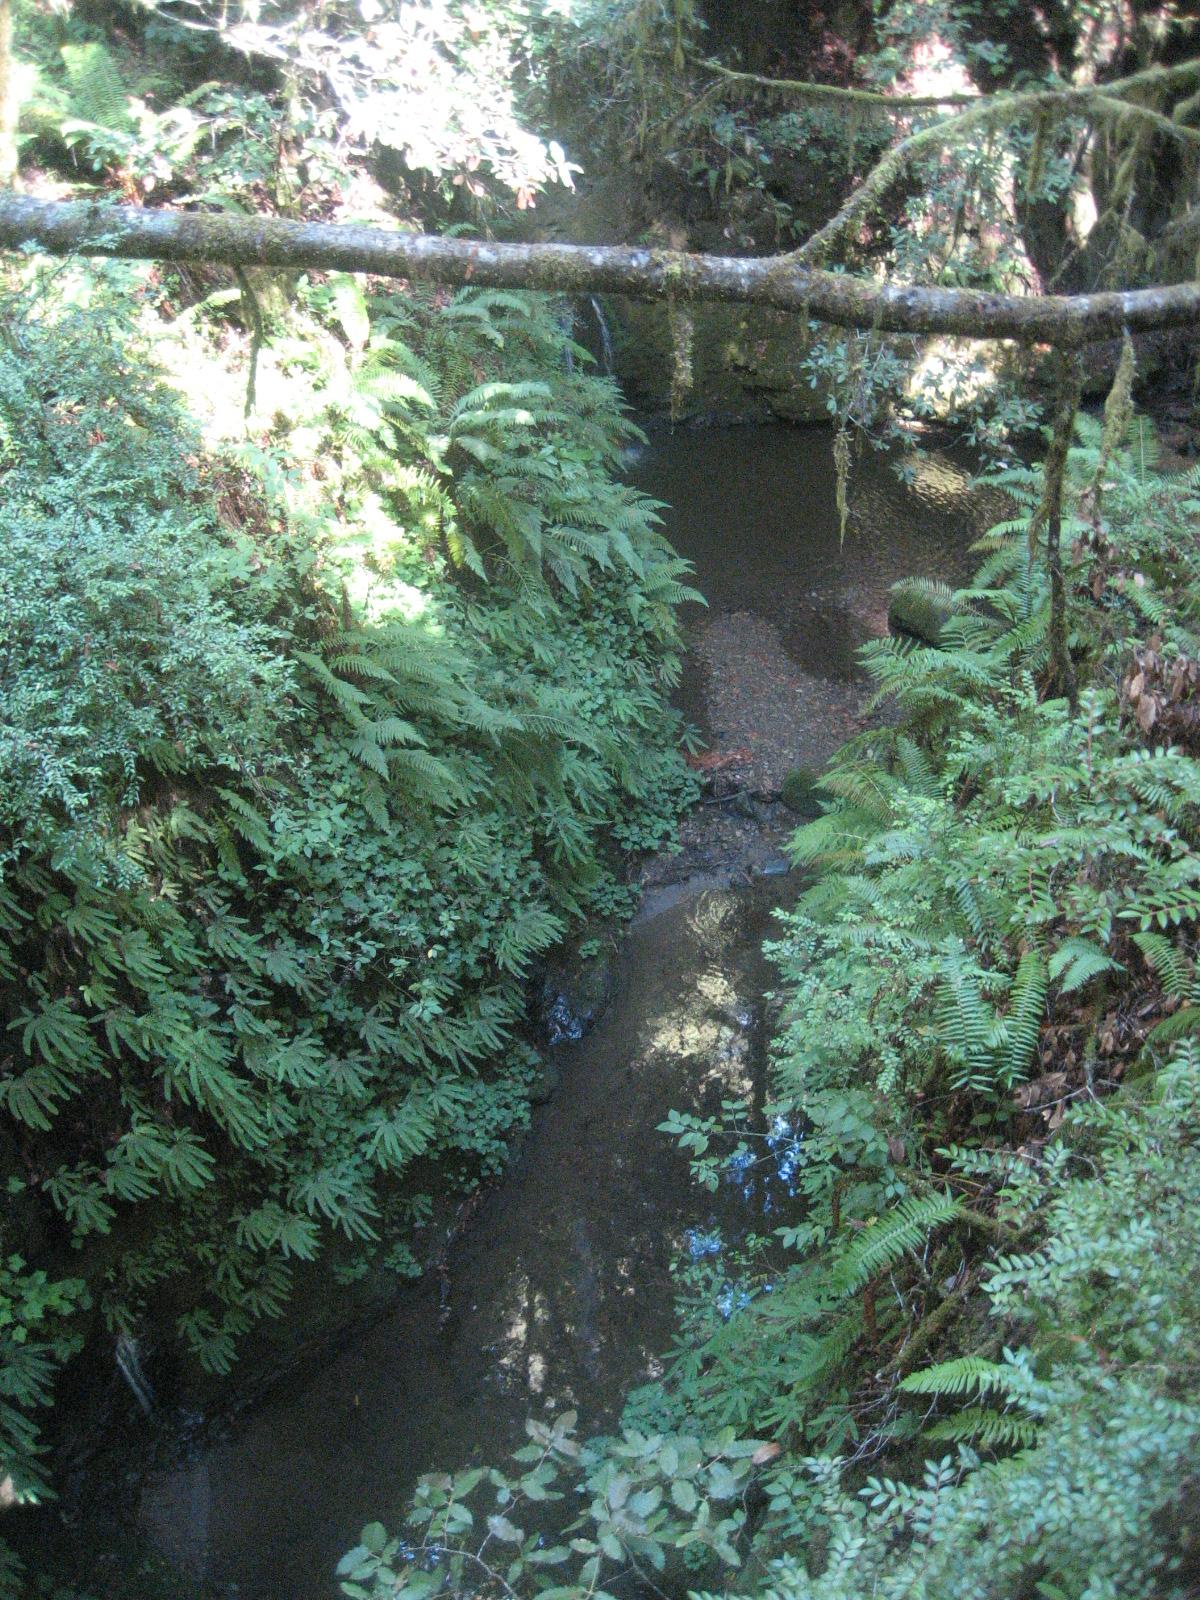 Santa Cruz Mountains Trails: Pescadero Creek County Park